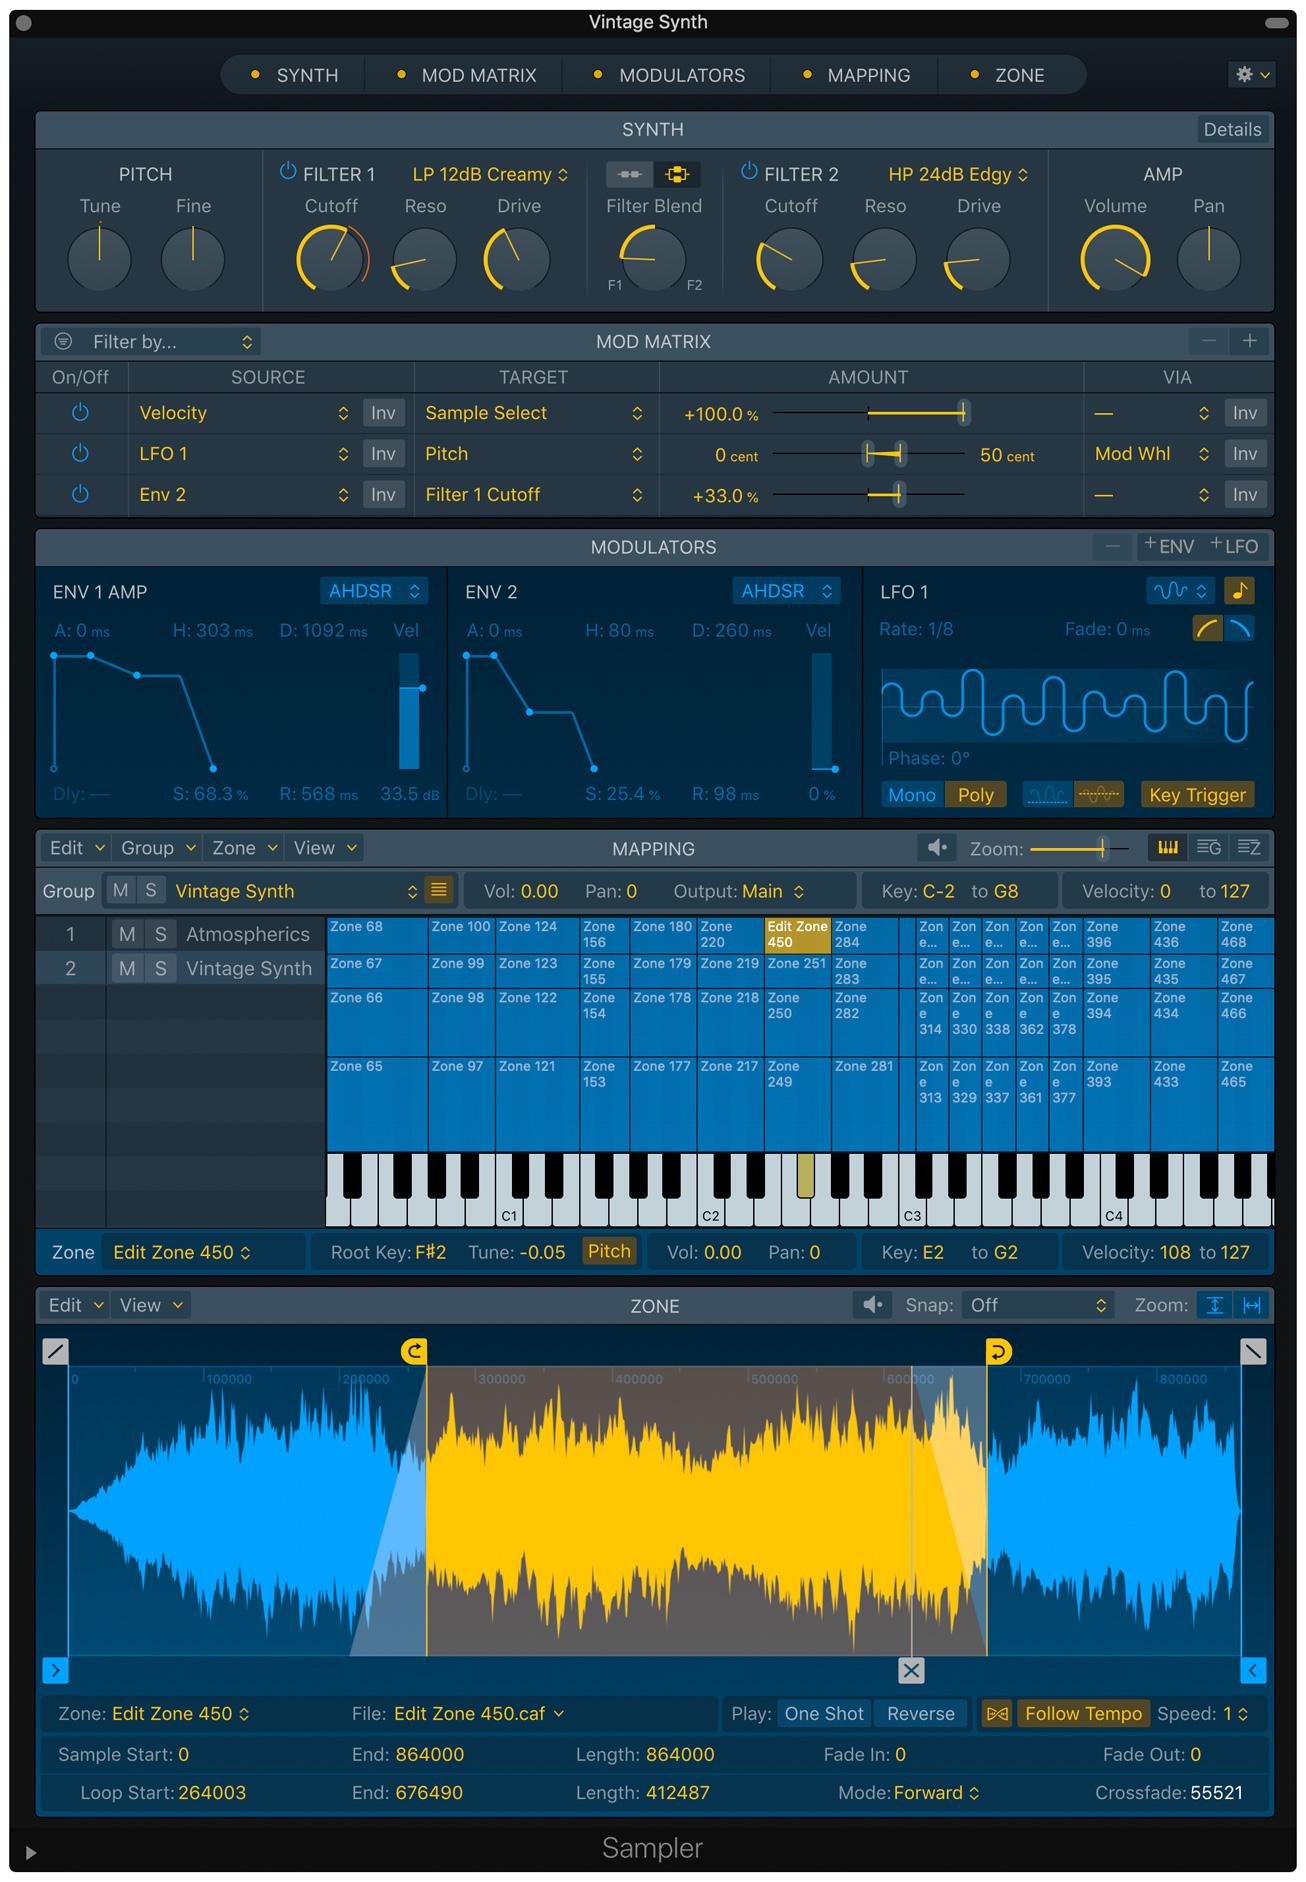 Logic Pro X 10.5